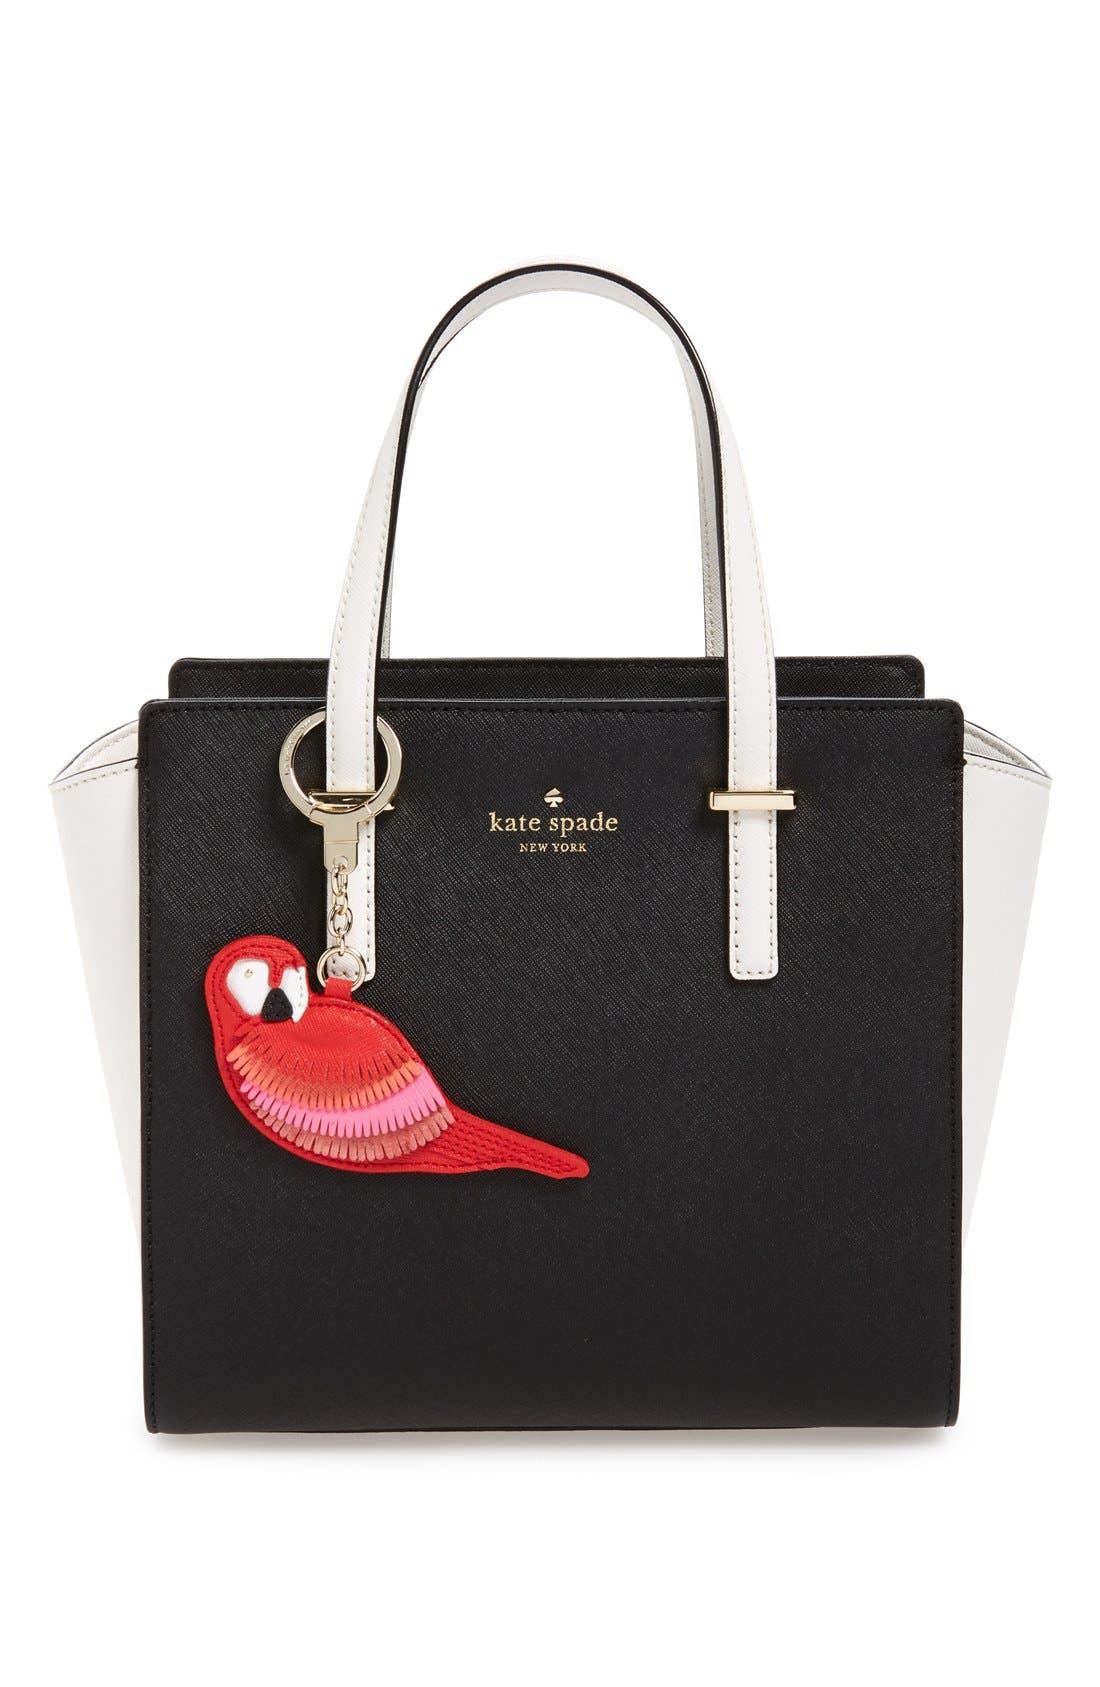 KATE SPADE NEW YORK,                             'parrot' bag charm,                             Alternate thumbnail 2, color,                             600